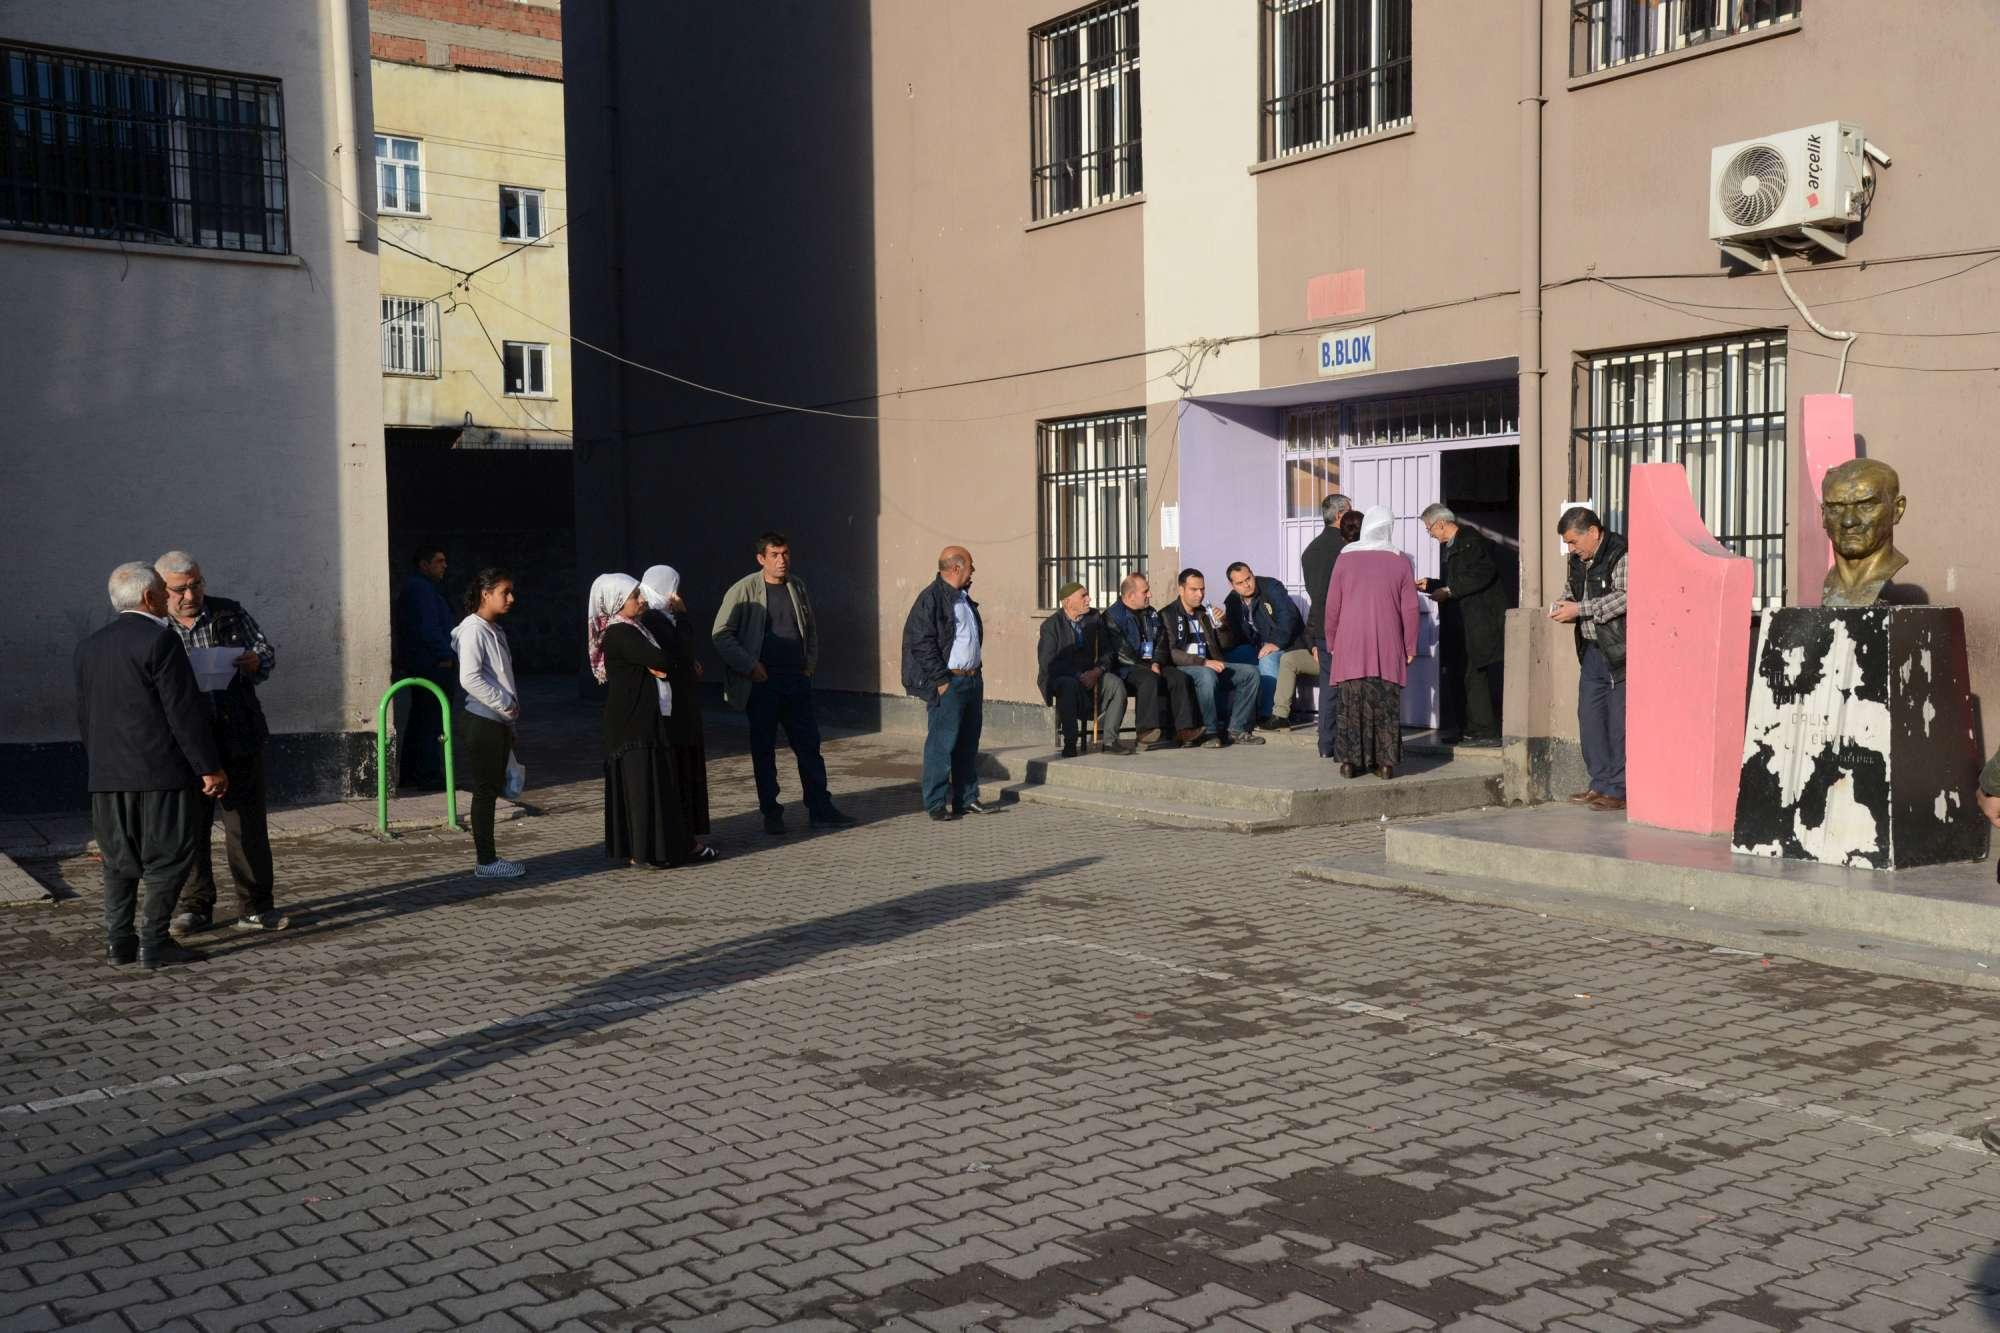 Turchia, urne aperte per il referendum sul presidenzialismo